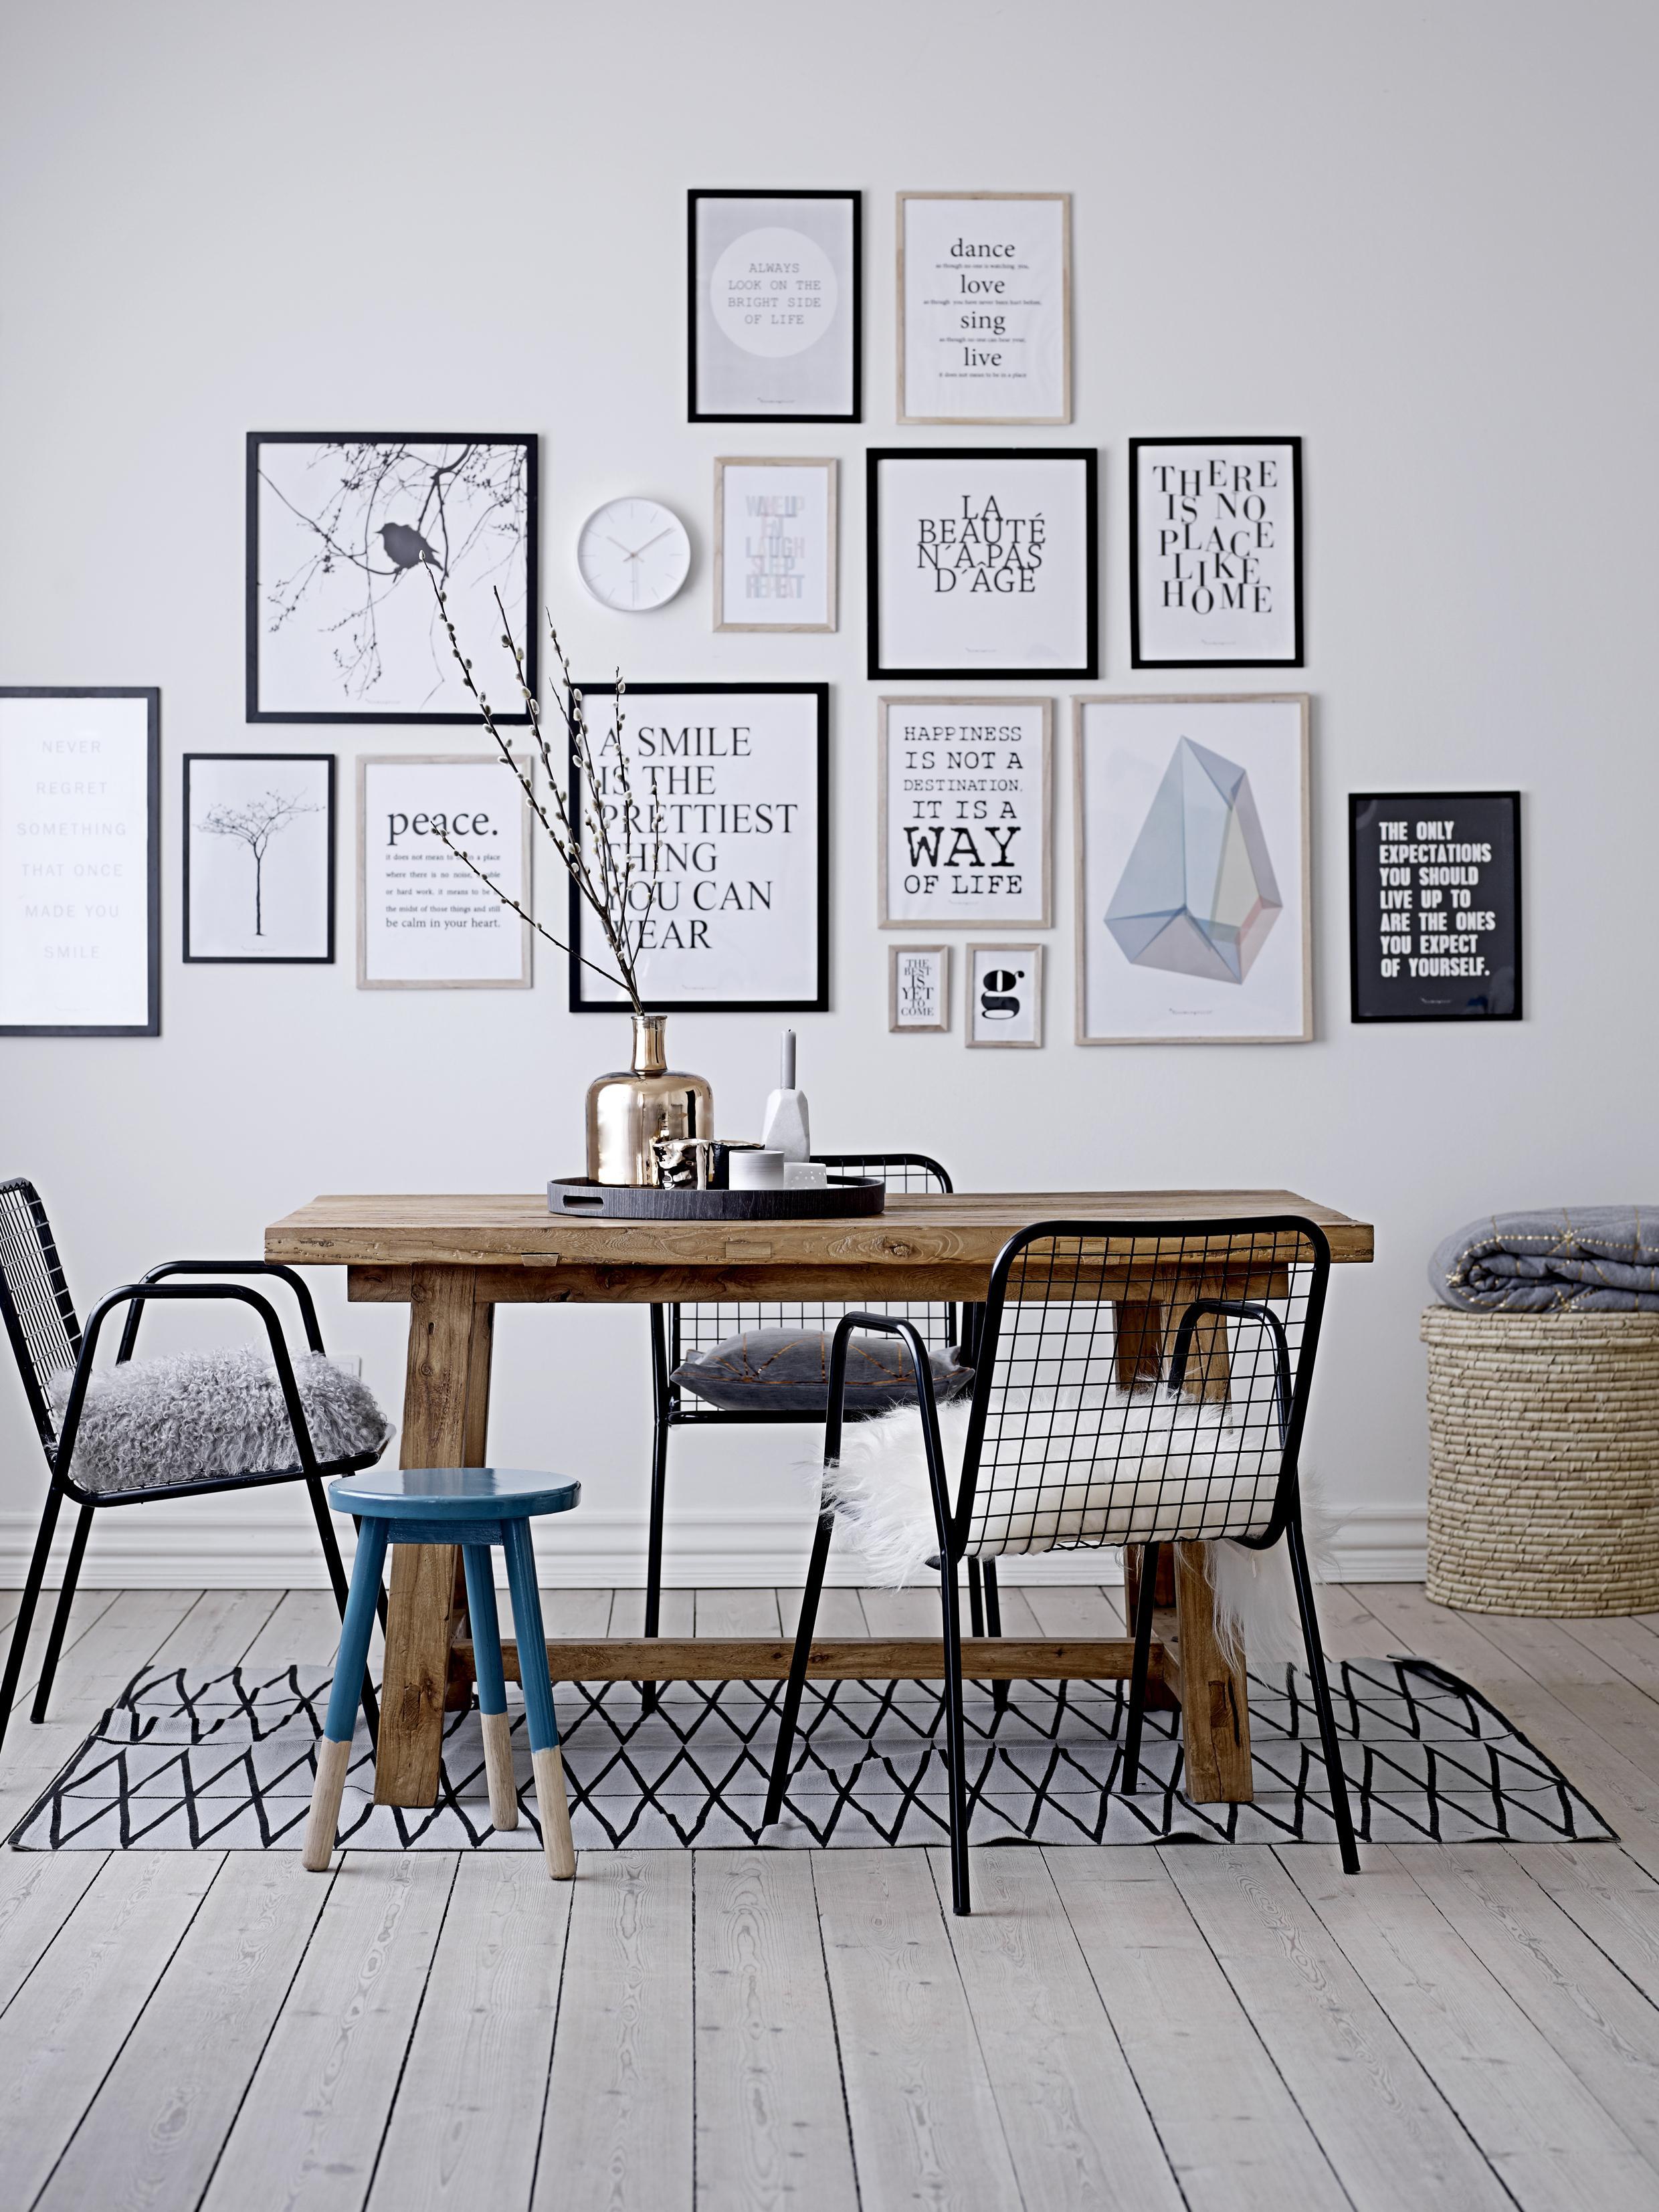 Wanddeko Mit Bilderrahmen #Holztisch #Bilderrahmen #